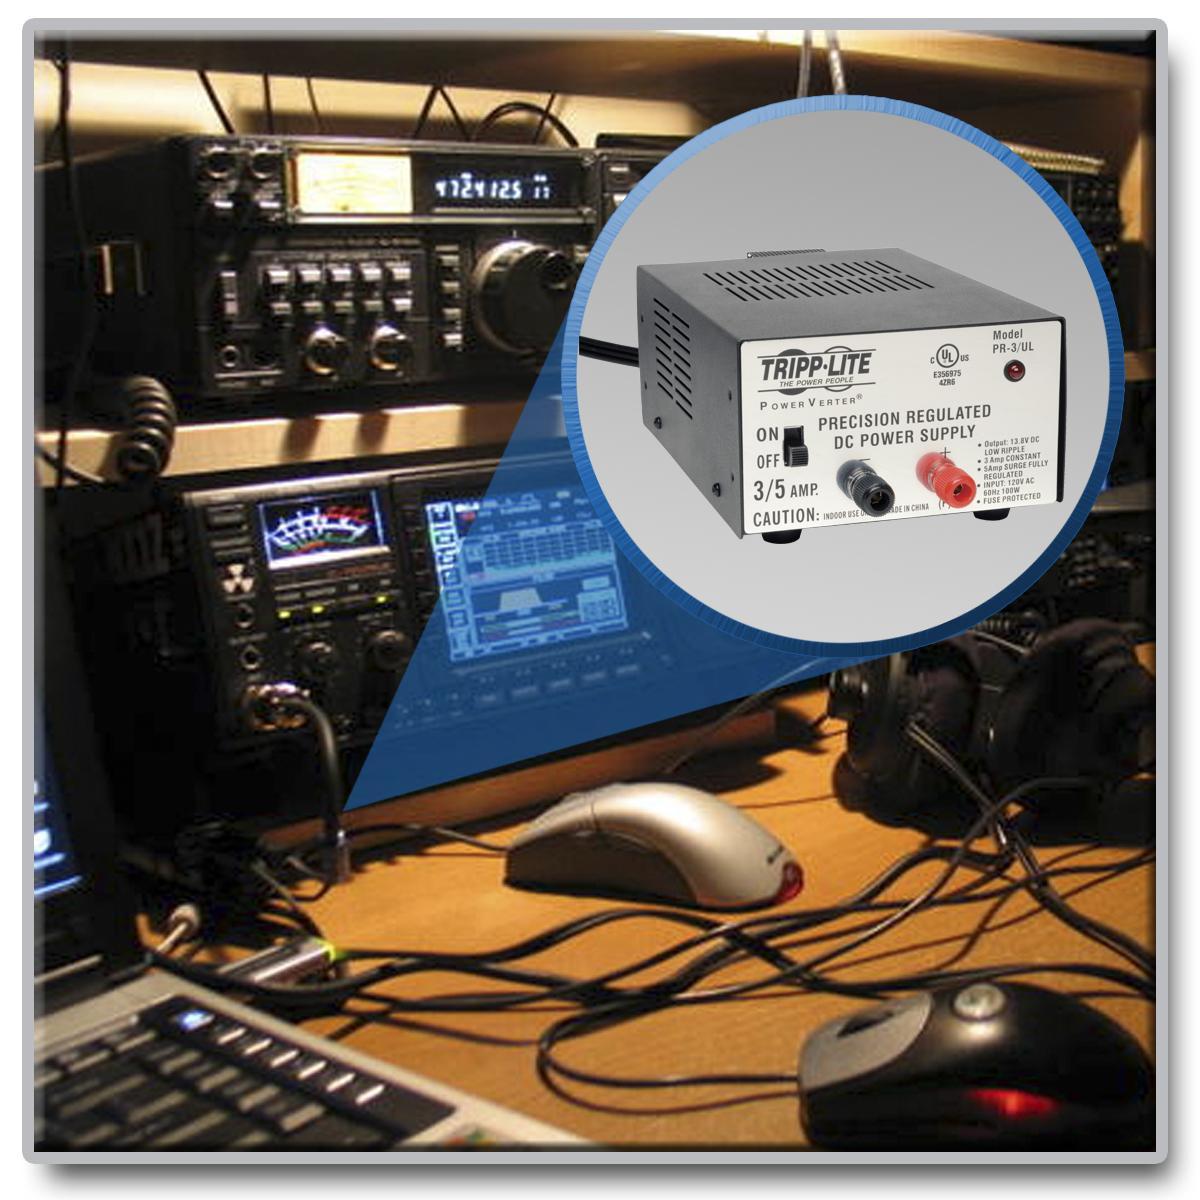 9 Volt 2 Ampere Dc Power Supply Circuit Diagram